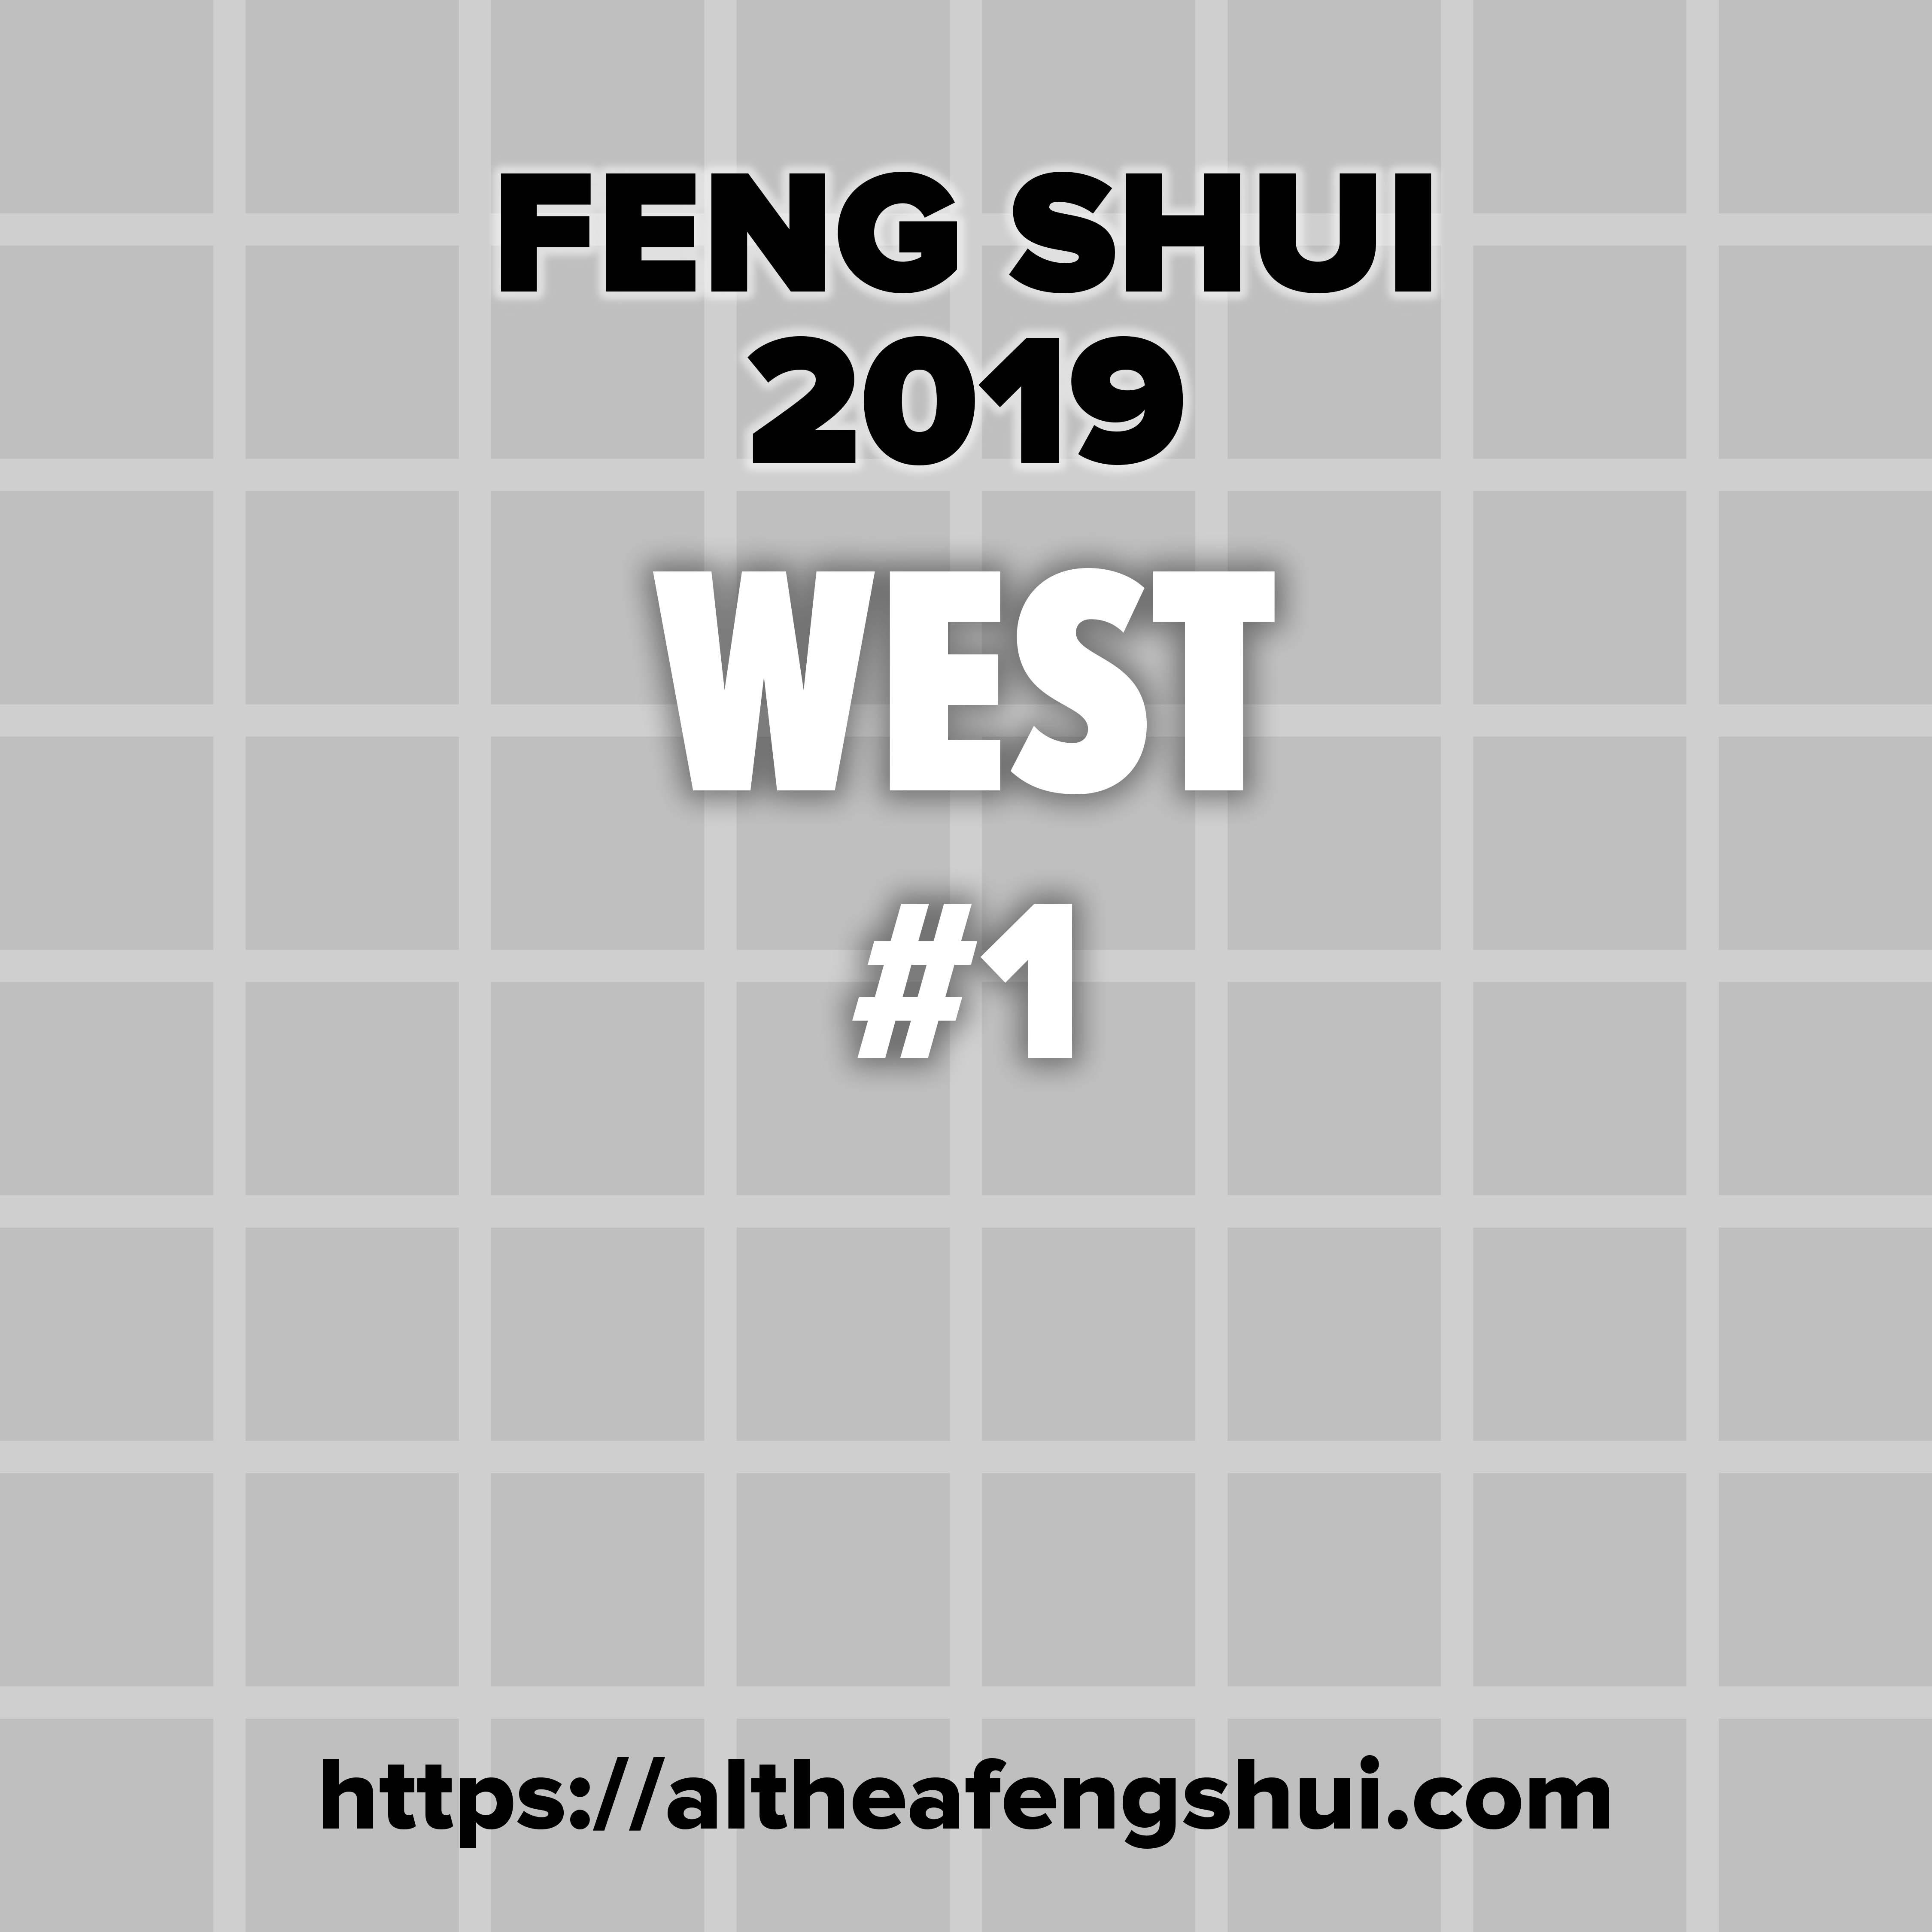 Flying Stars West 2019